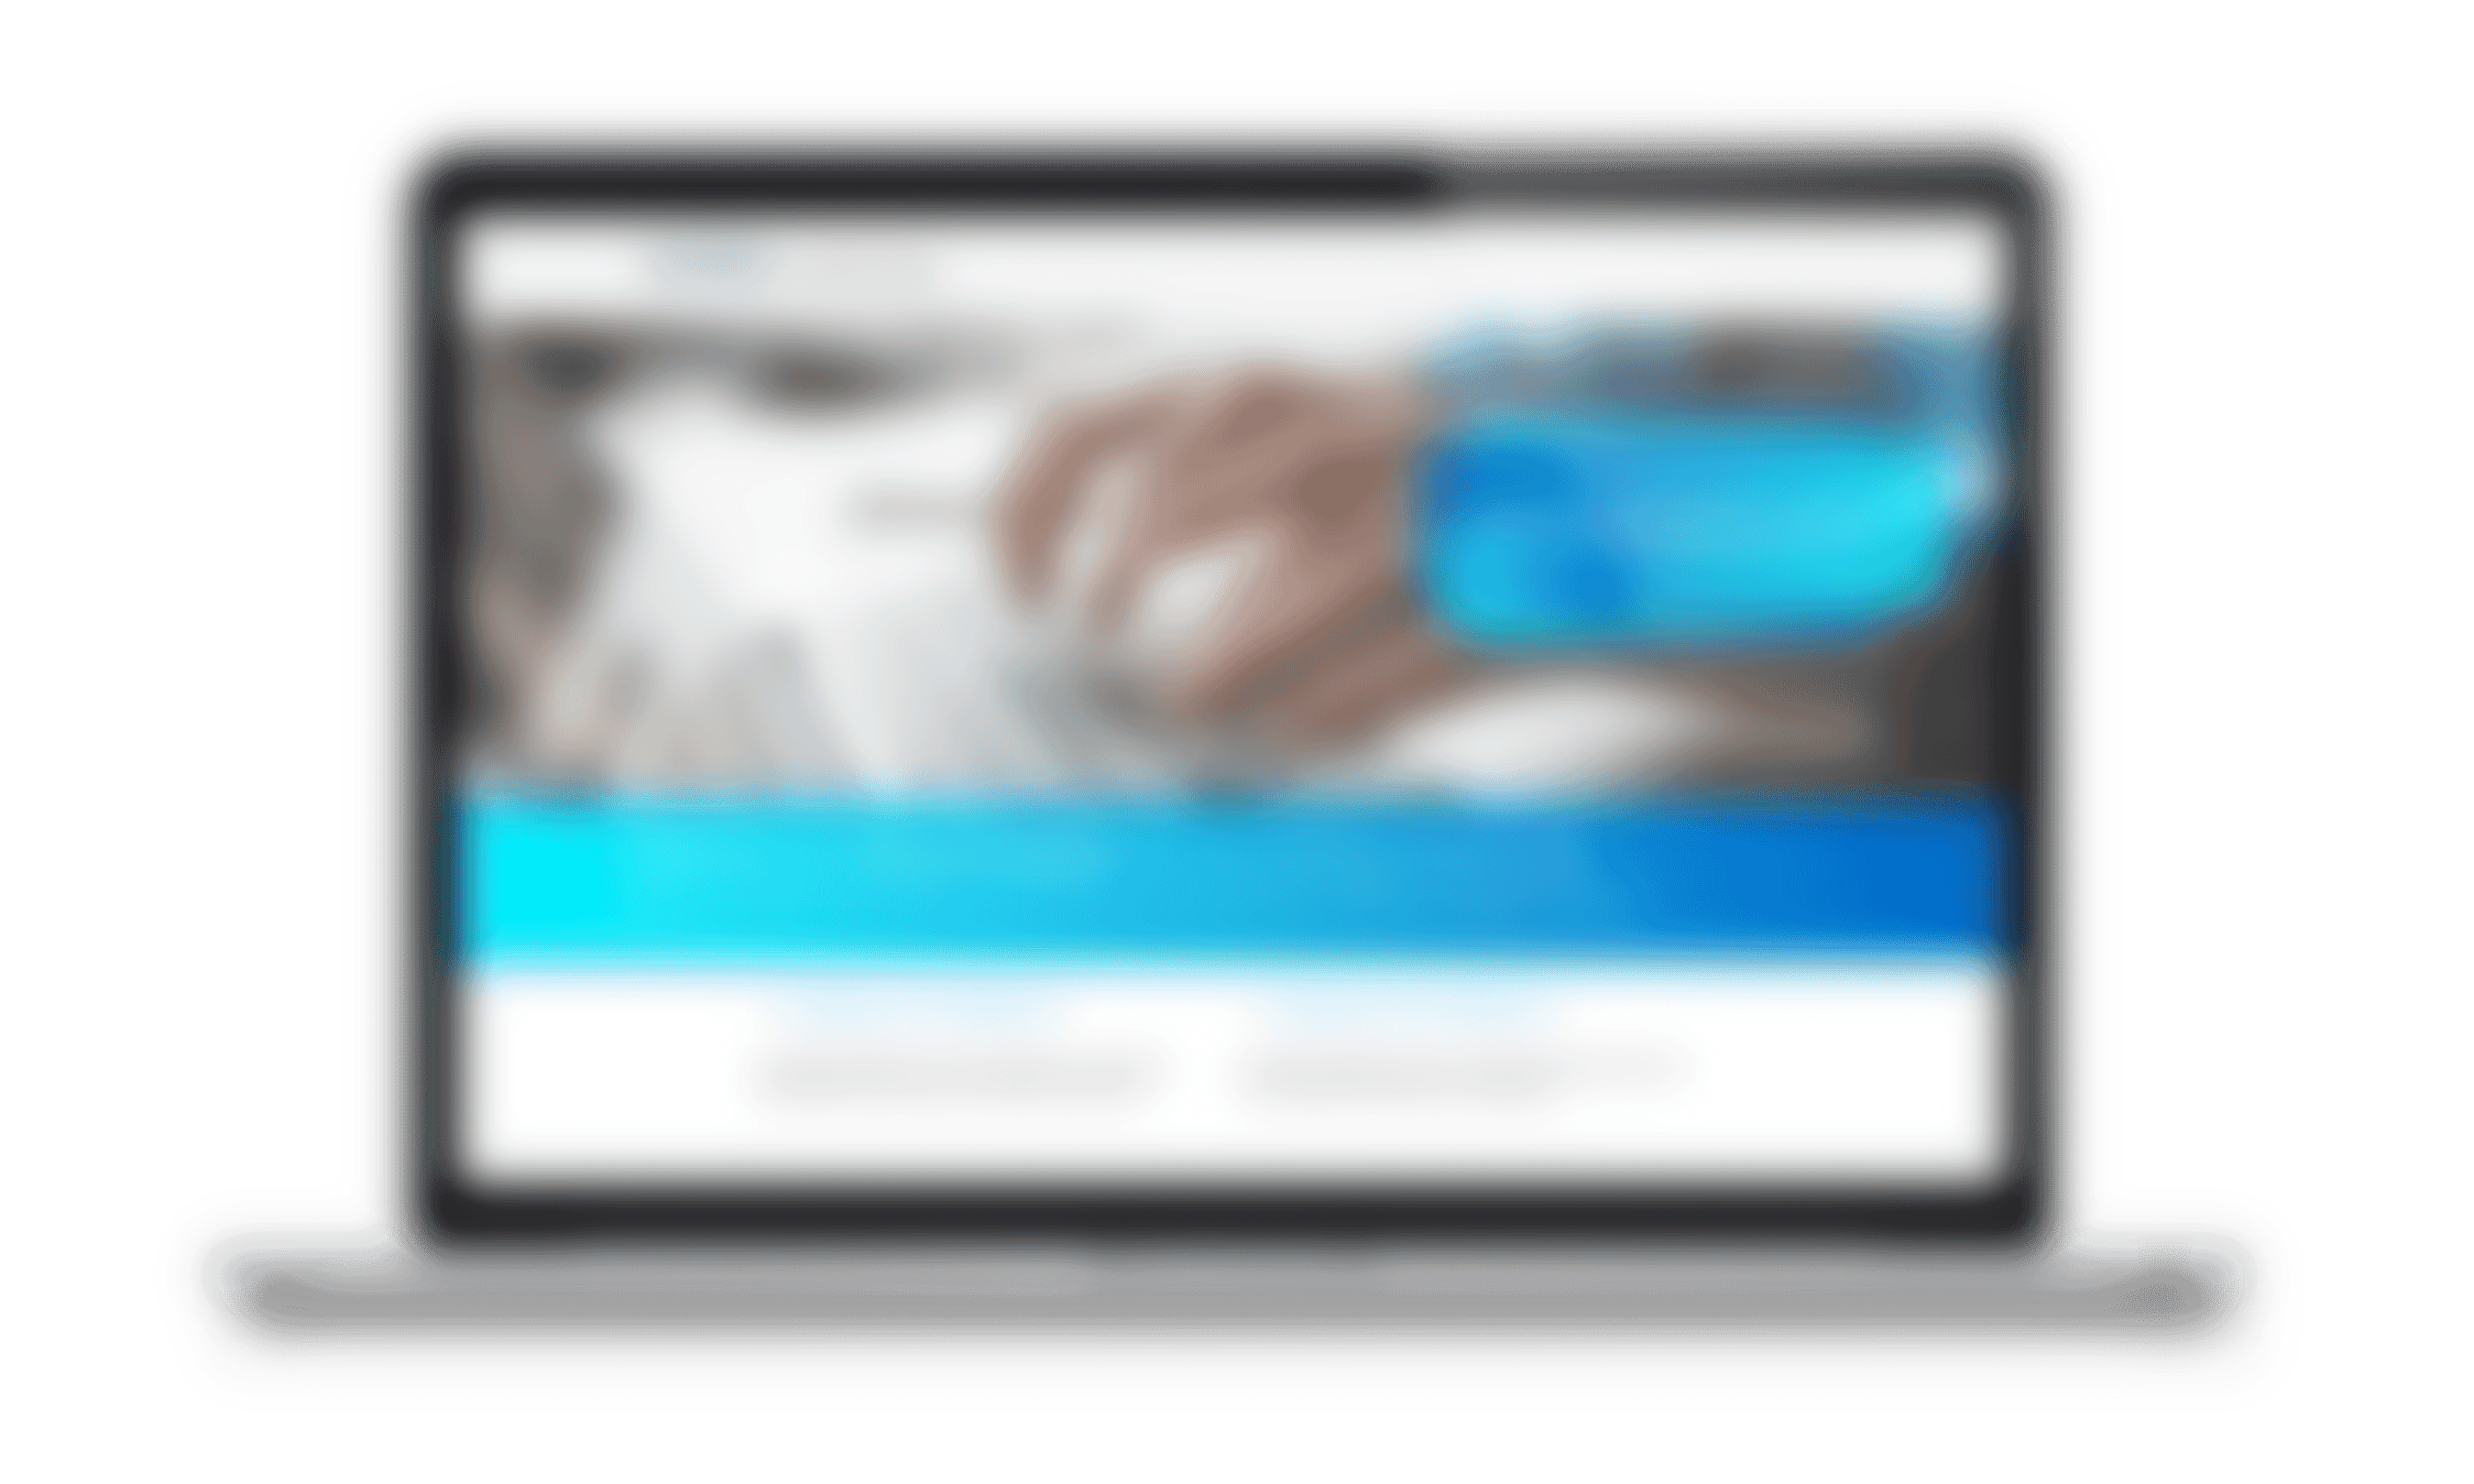 Avaloq Webhelp on laptop